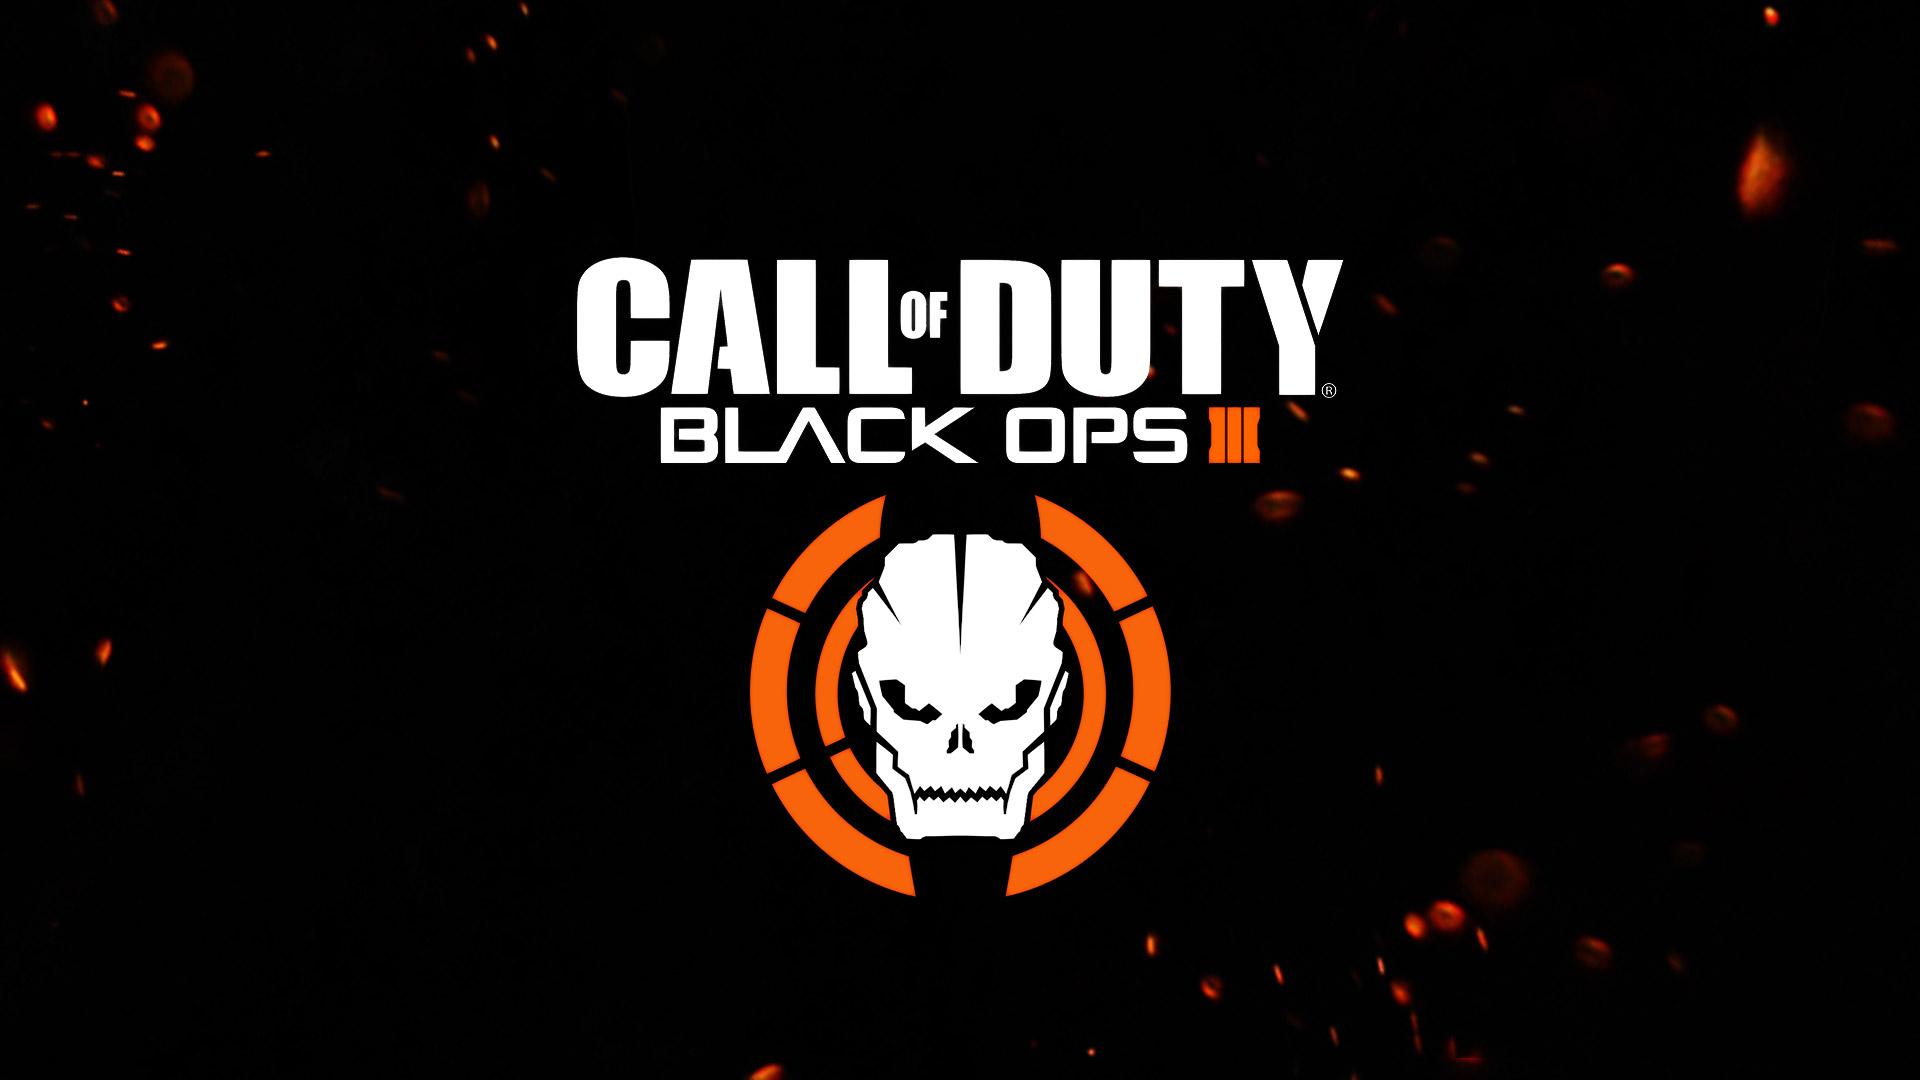 Call of Duty Black Ops 3 wallpaper 15 1920x1080